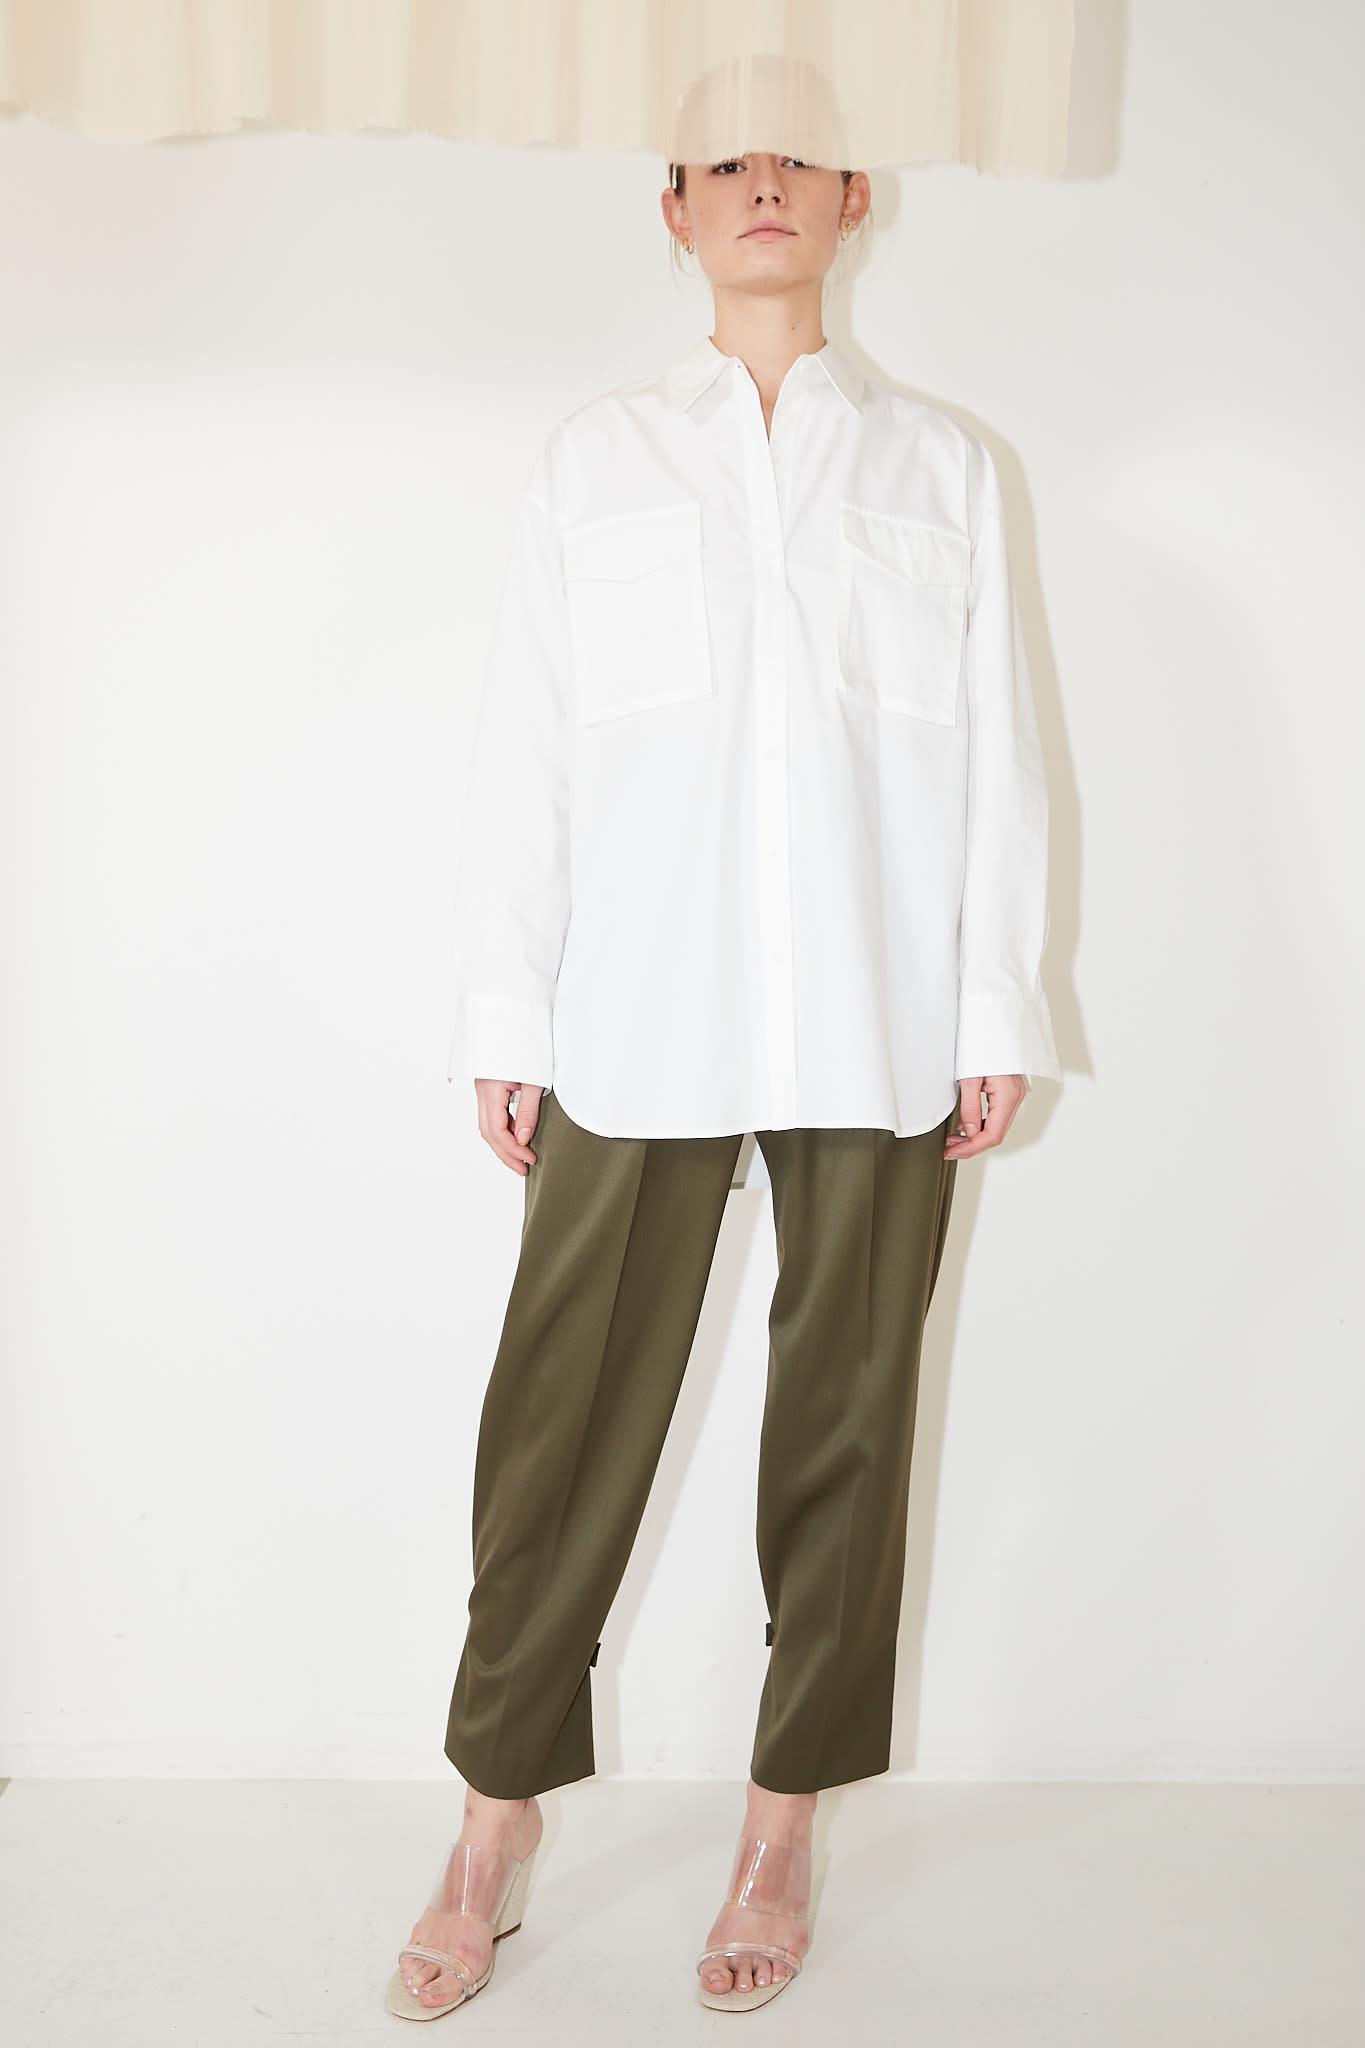 Drae - Out pocket boxy shirt